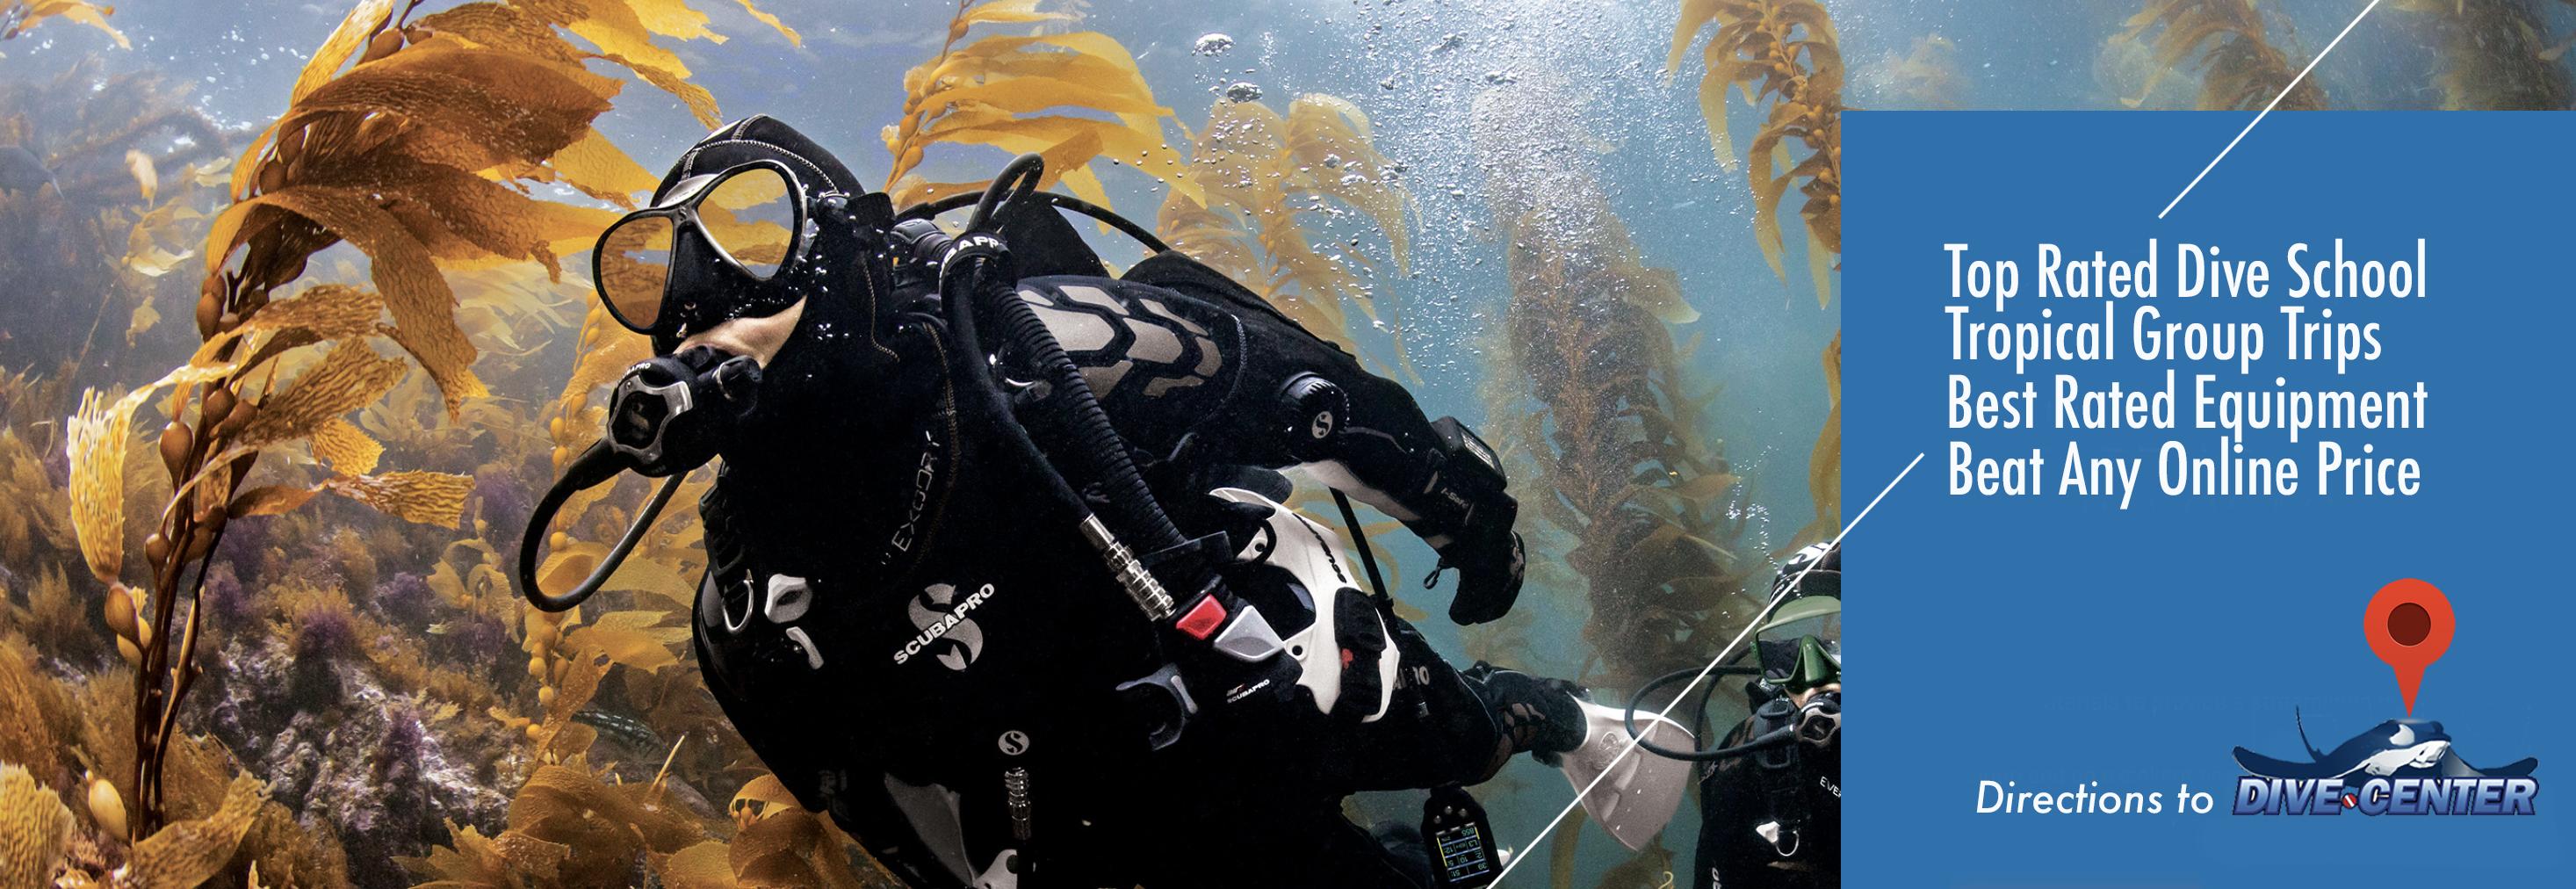 DiveCenter com is Southern California's Scuba Diving HQ